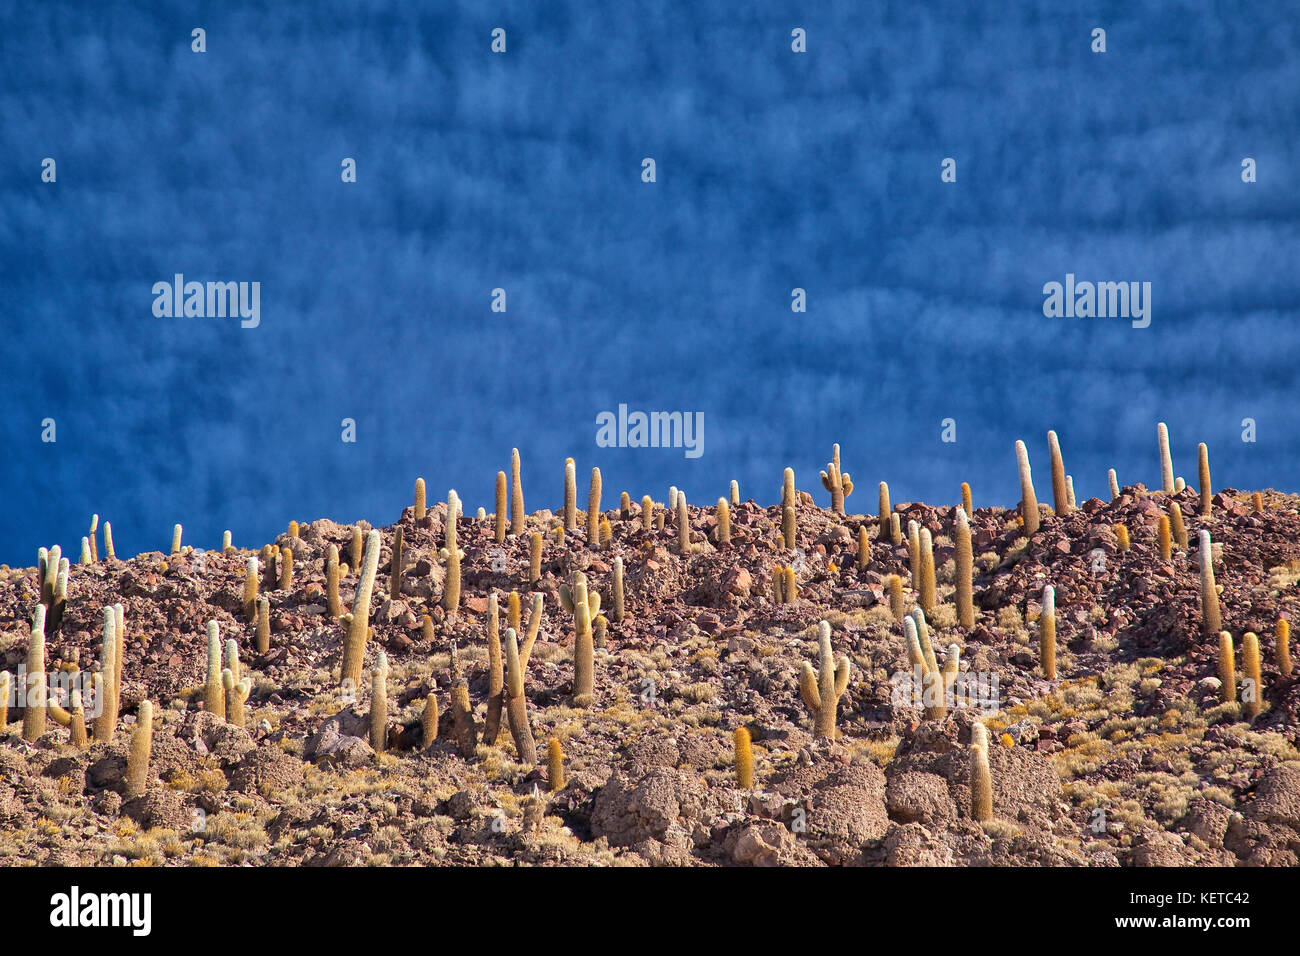 Kaktus auf Hügeln und Felsen der Isla Incahuasi in der Salar de Uyuni Süden Lipez Bolivien Südamerika. Stockbild